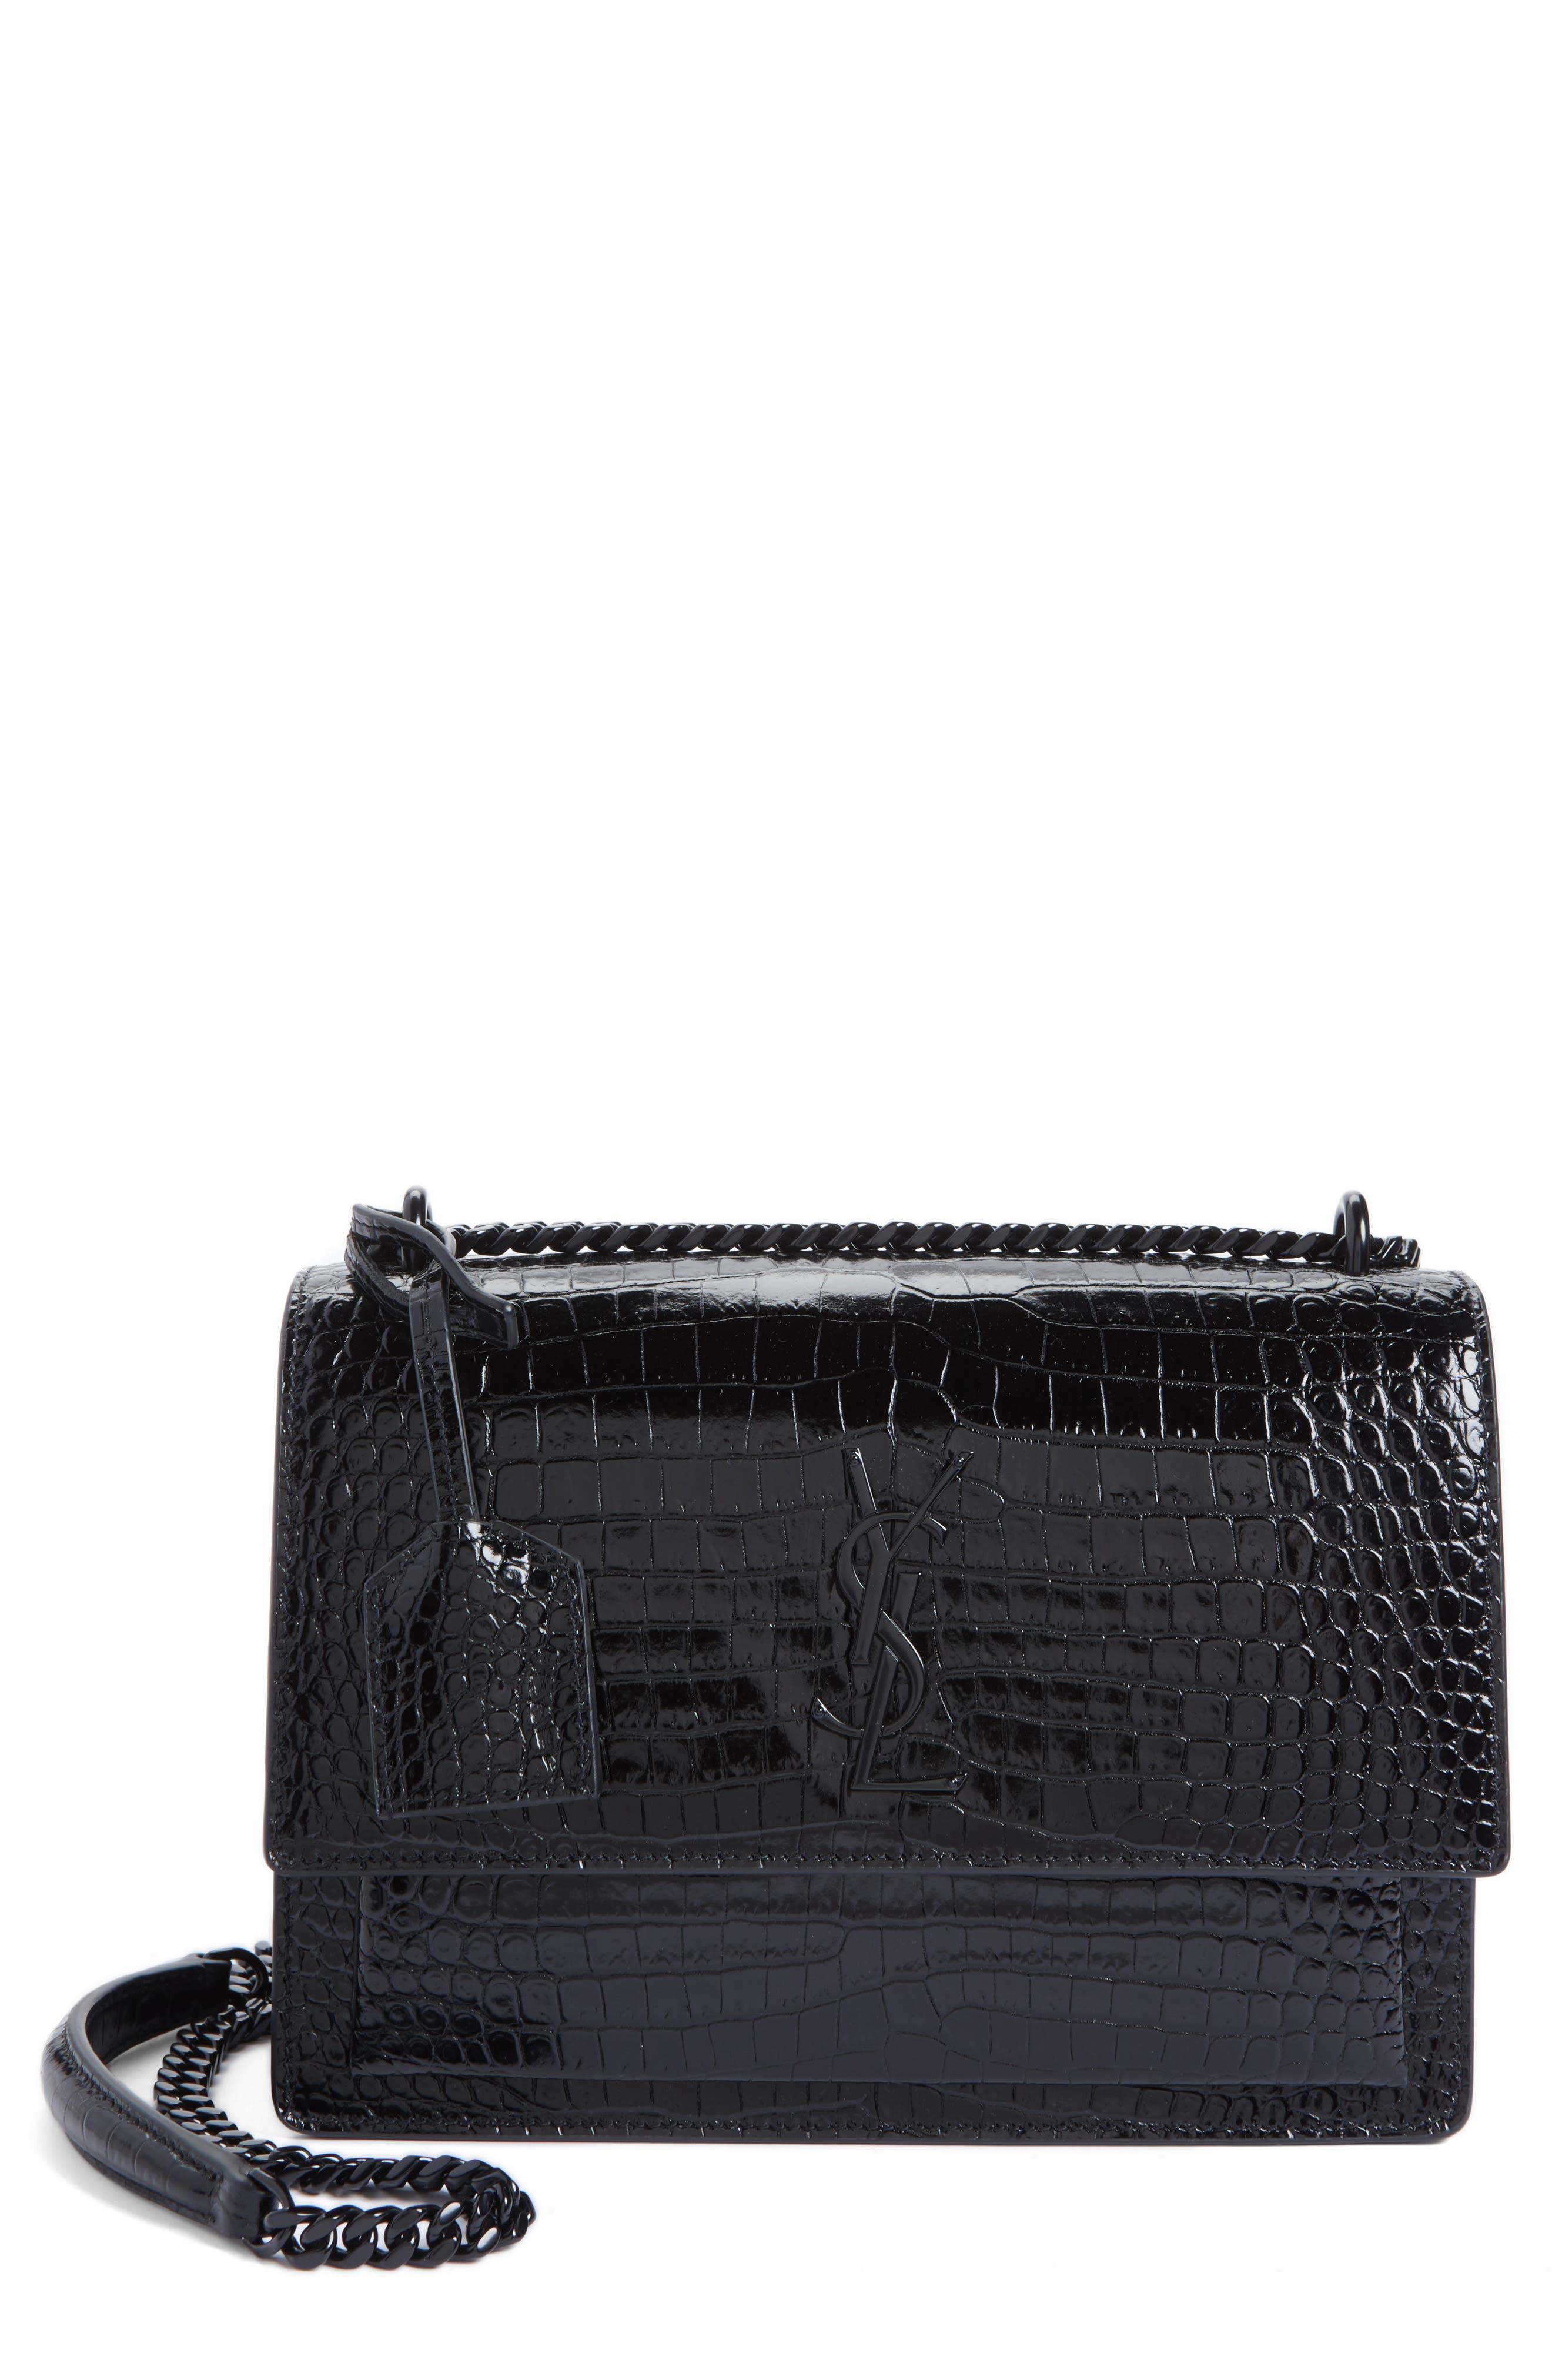 Main Image - Saint Laurent Medium Sunset Croc Embossed Leather Shoulder Bag